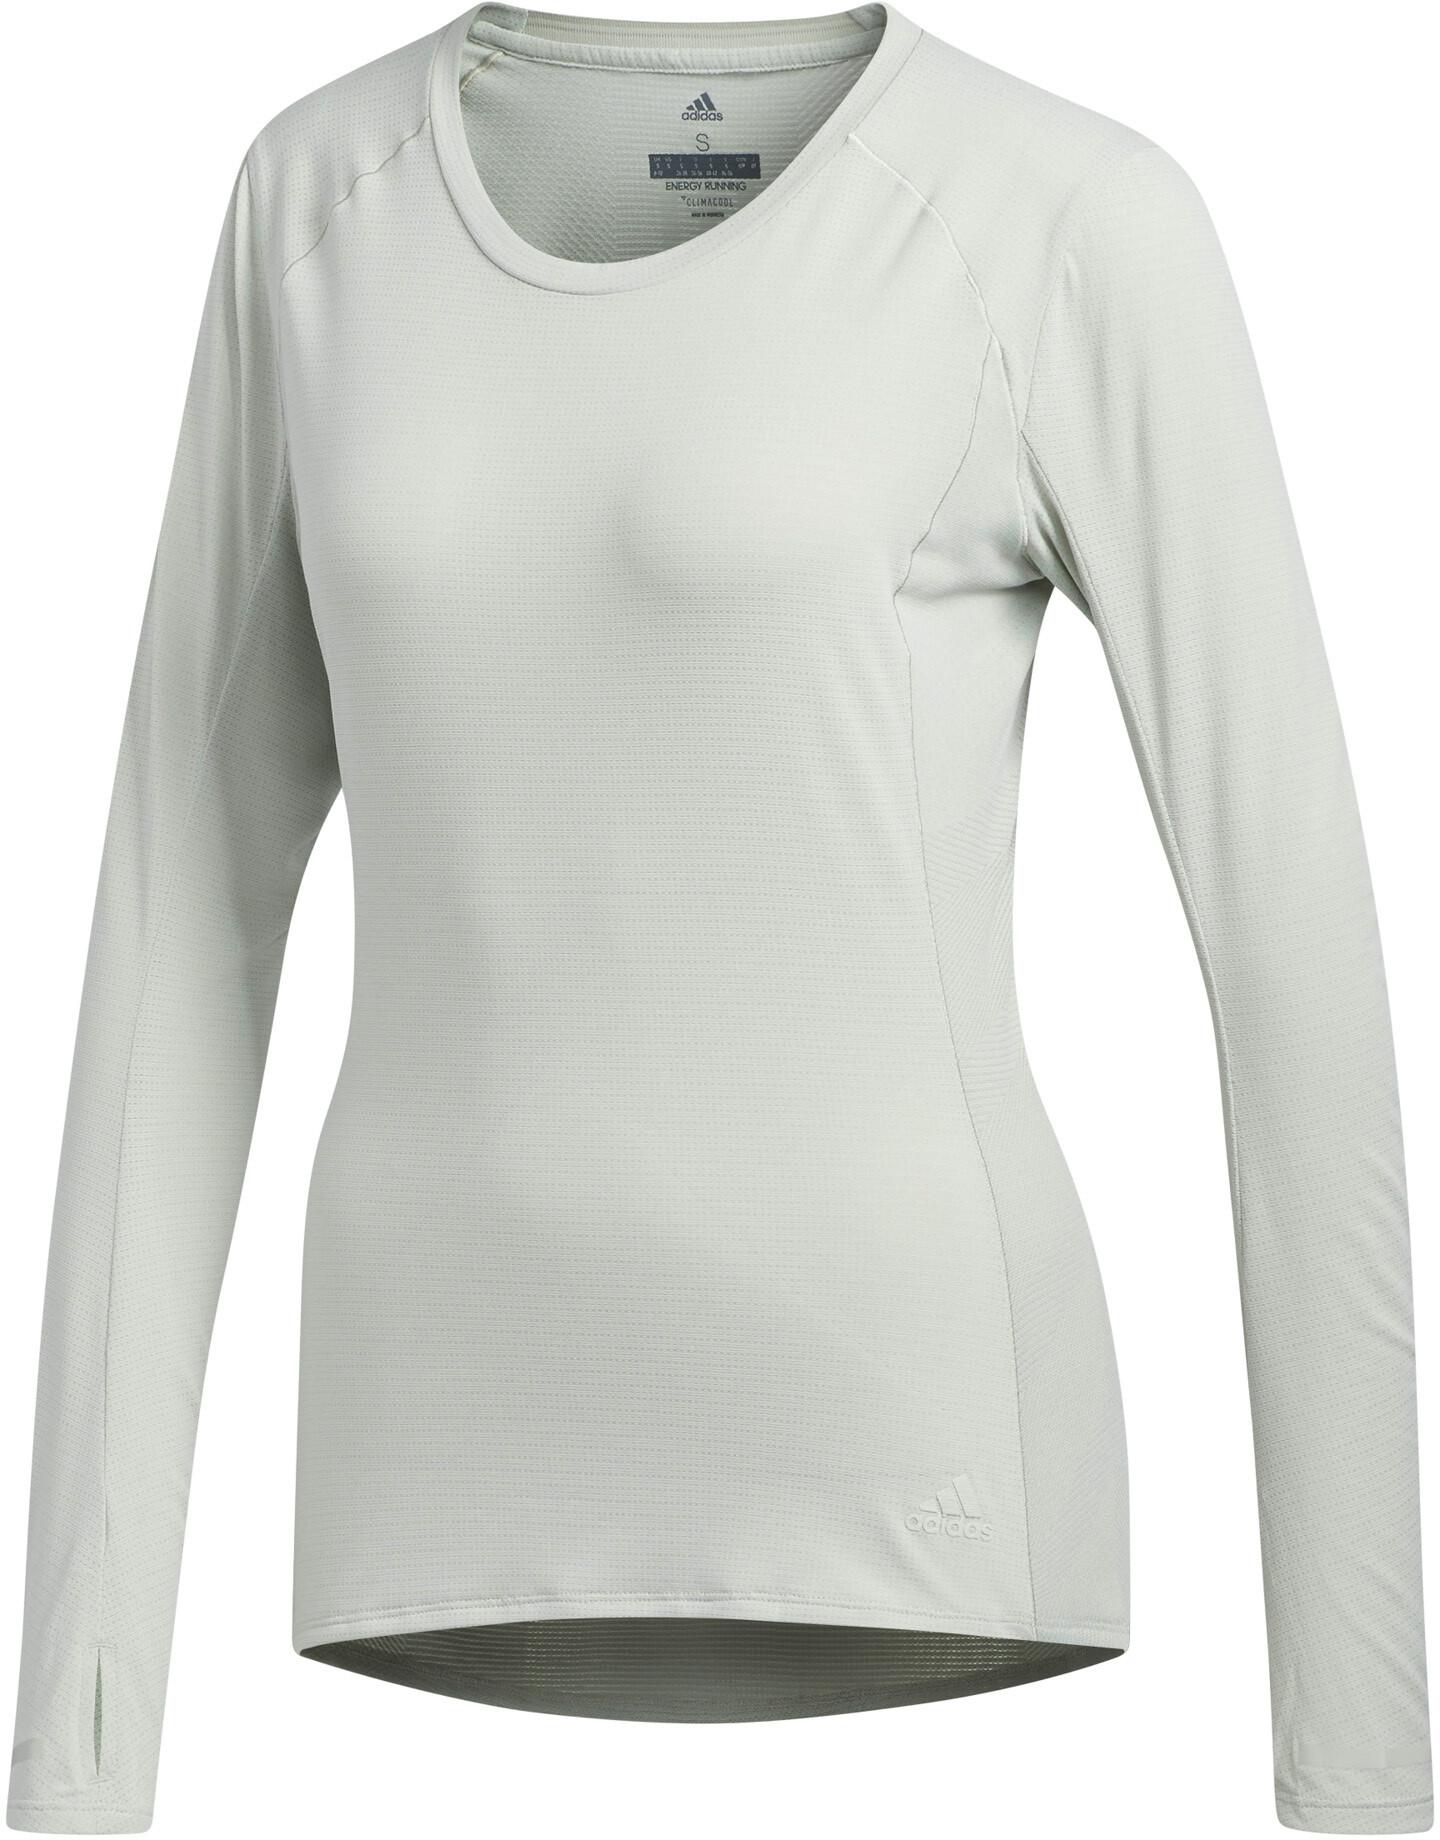 4056a55055c adidas Supernova Hardloopshirt lange mouwen Dames wit I Eenvoudig ...